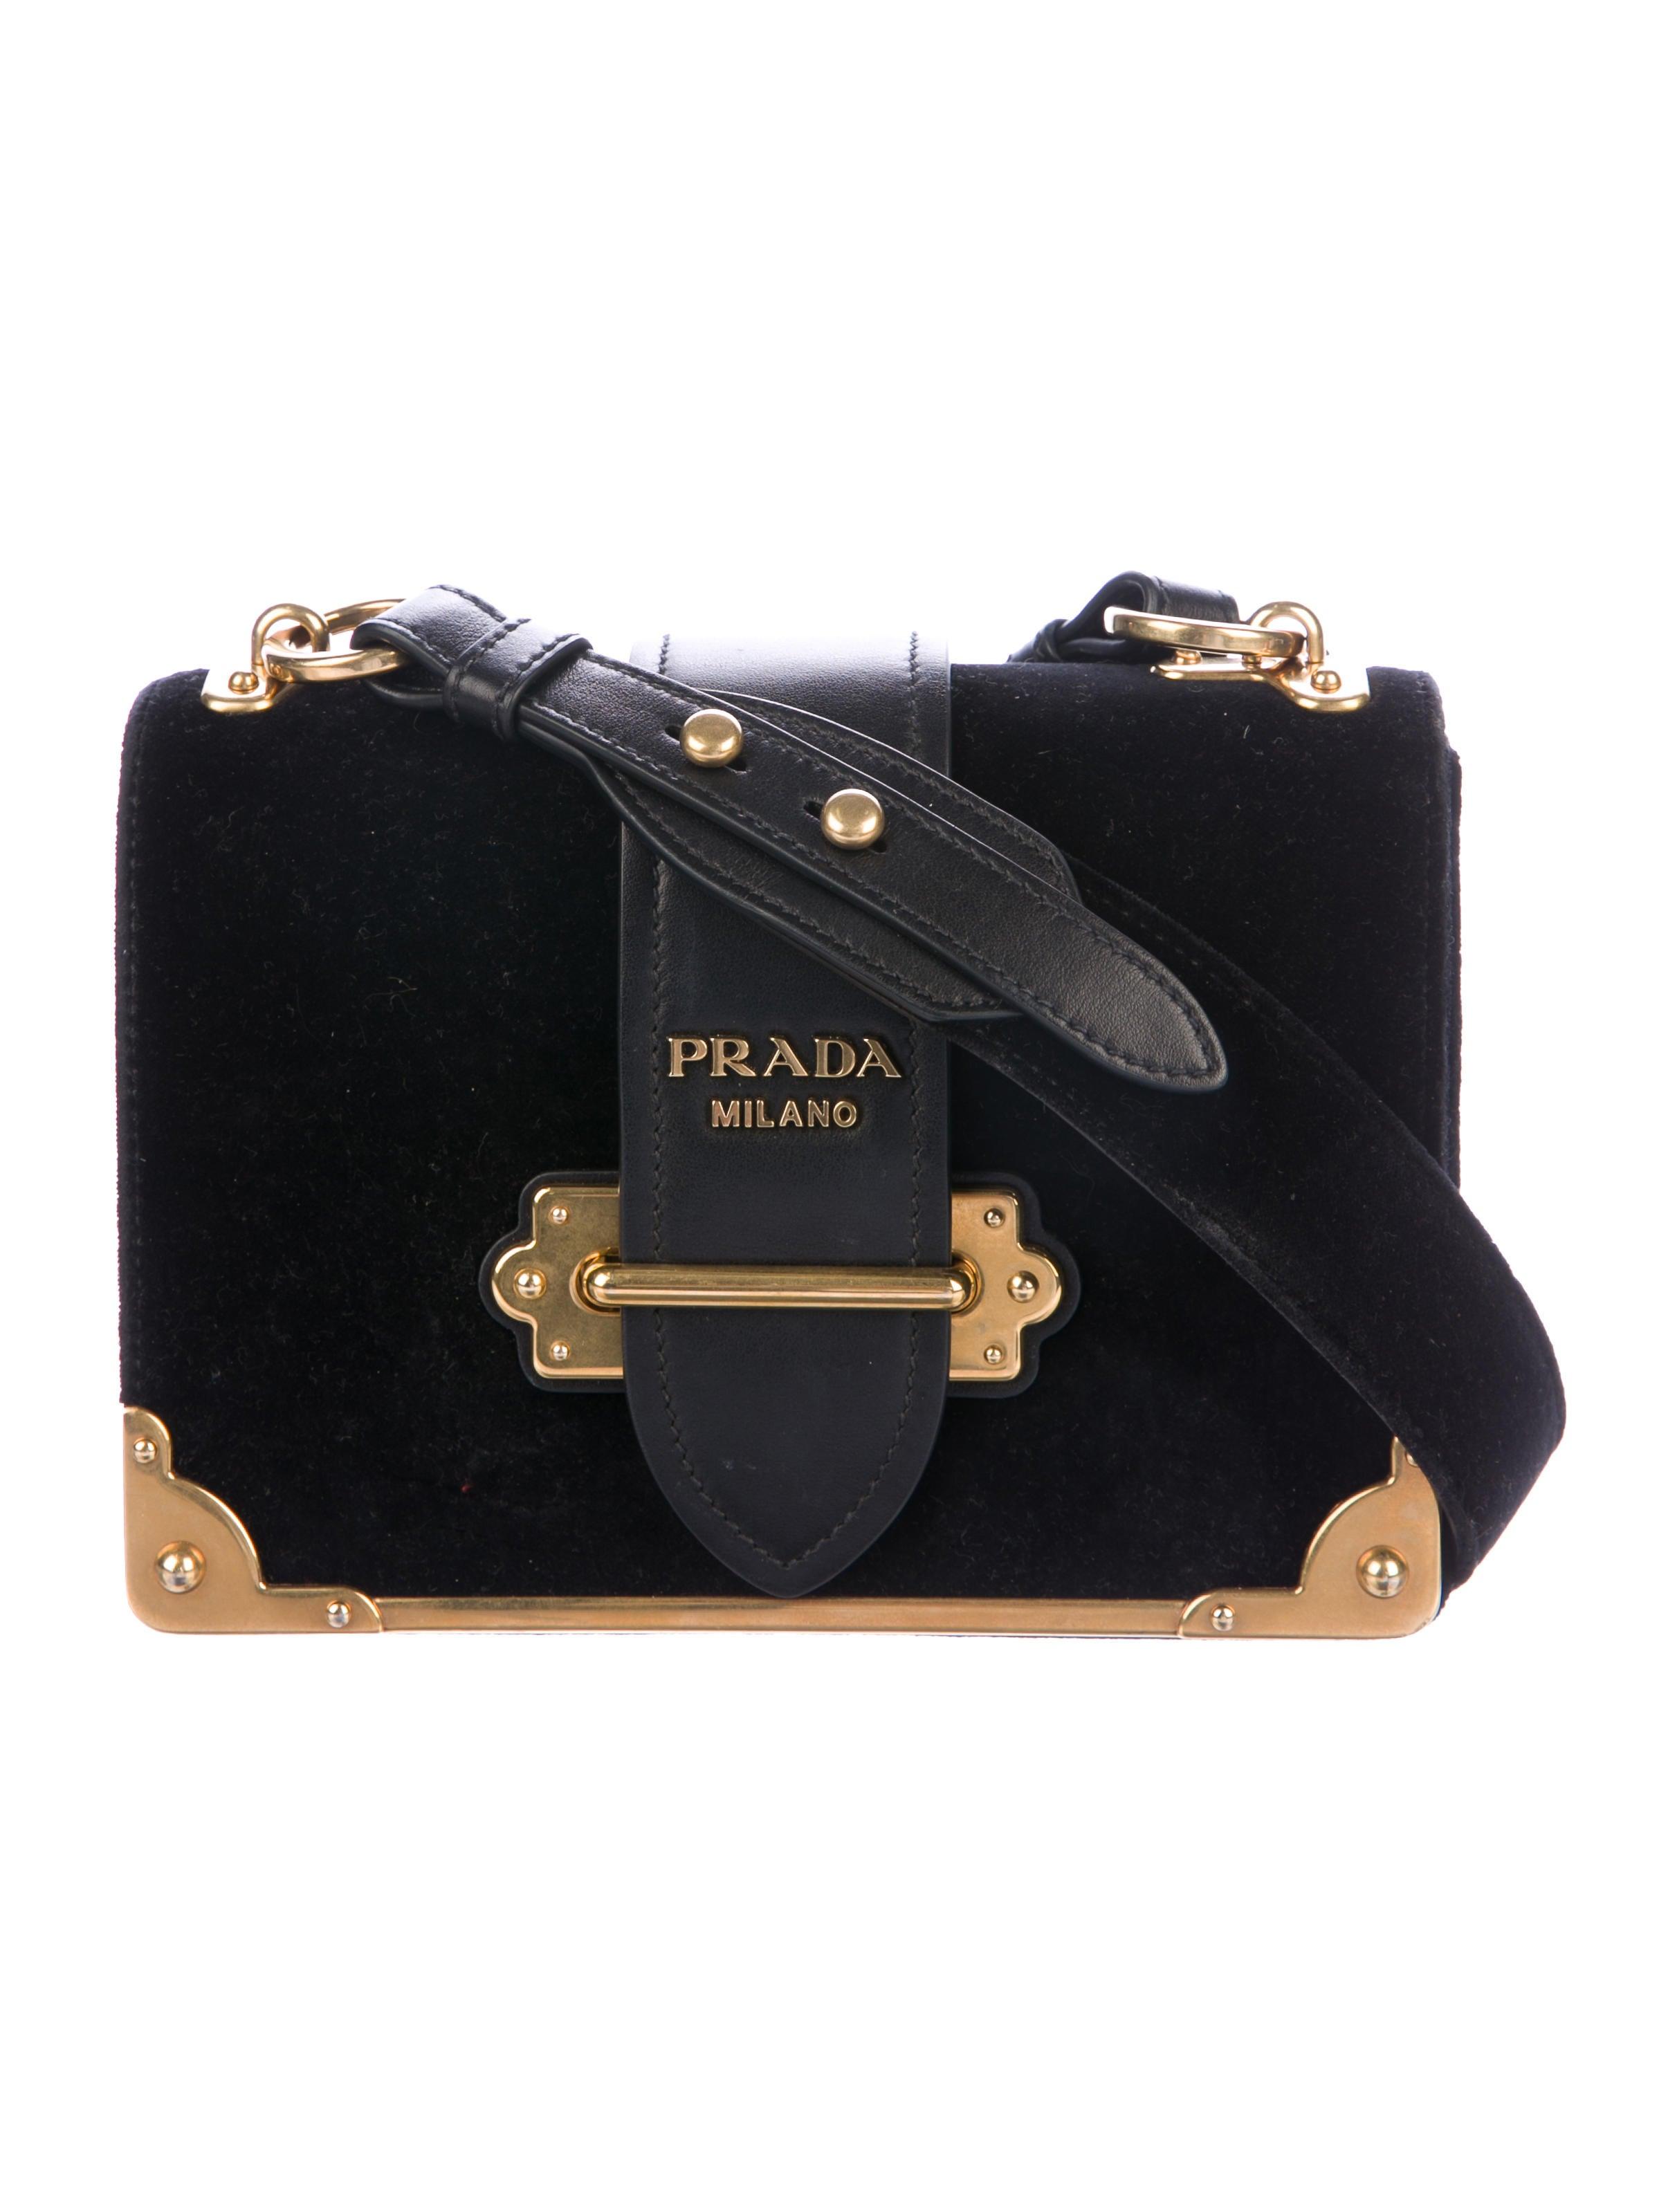 12bb0145c583 Prada Cahier Velvet Bag - Handbags - PRA209934 | The RealReal